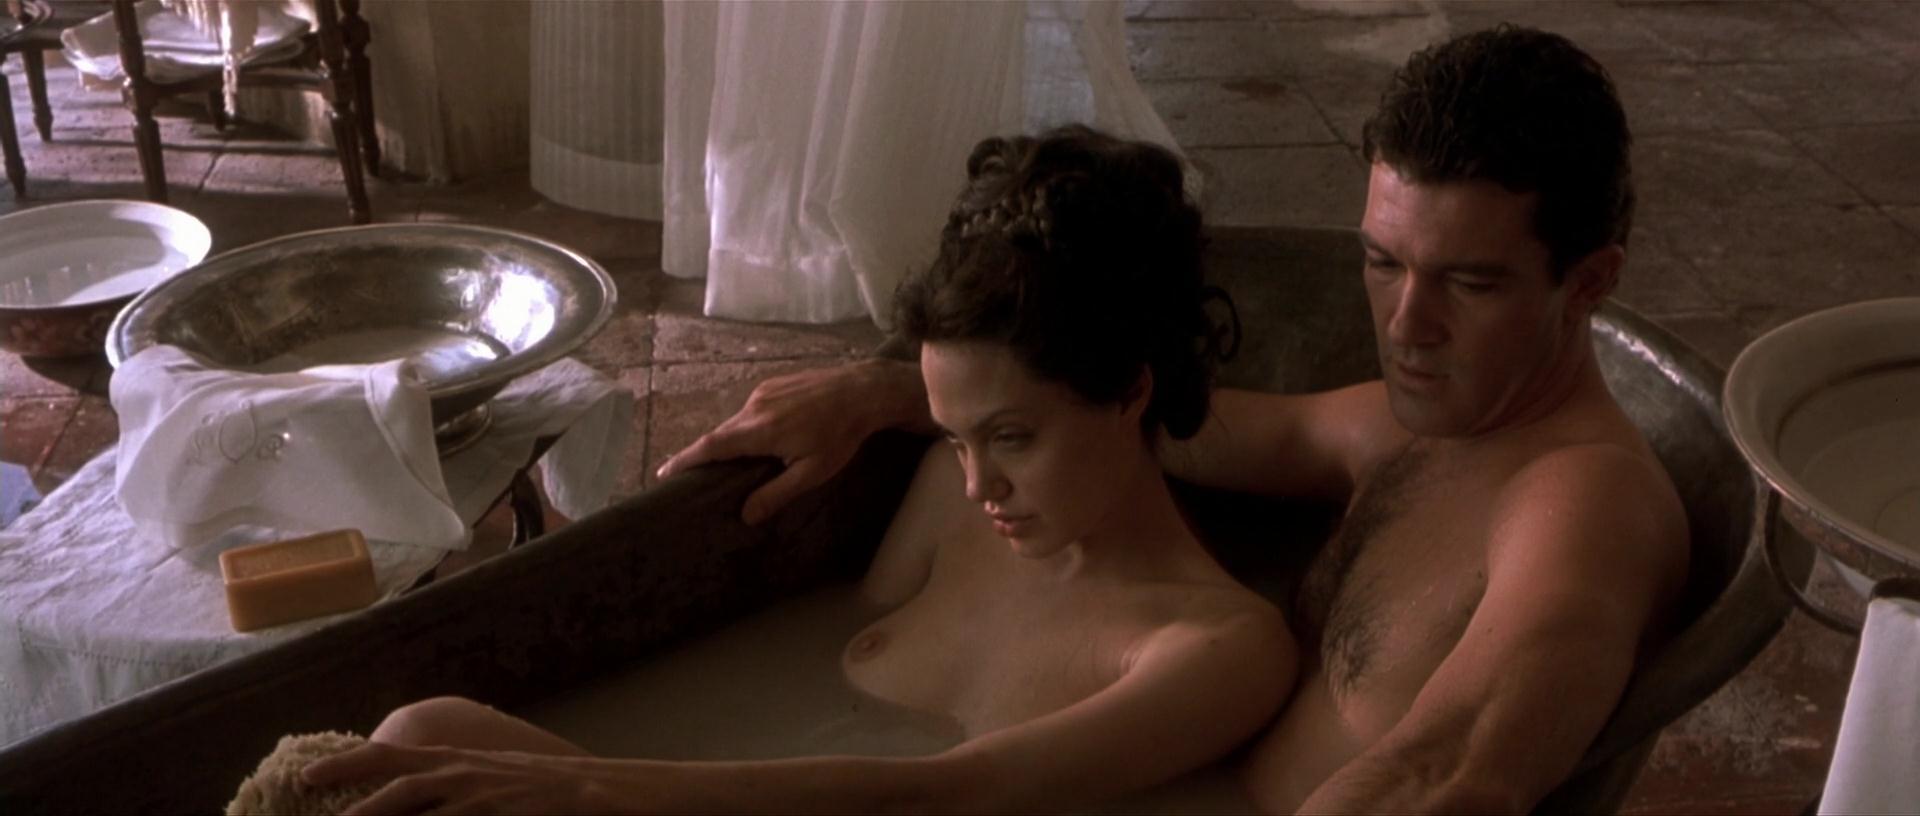 Angelina Jolie Film Nuda angelina jolie porno movies . porn galleries. comments: 1